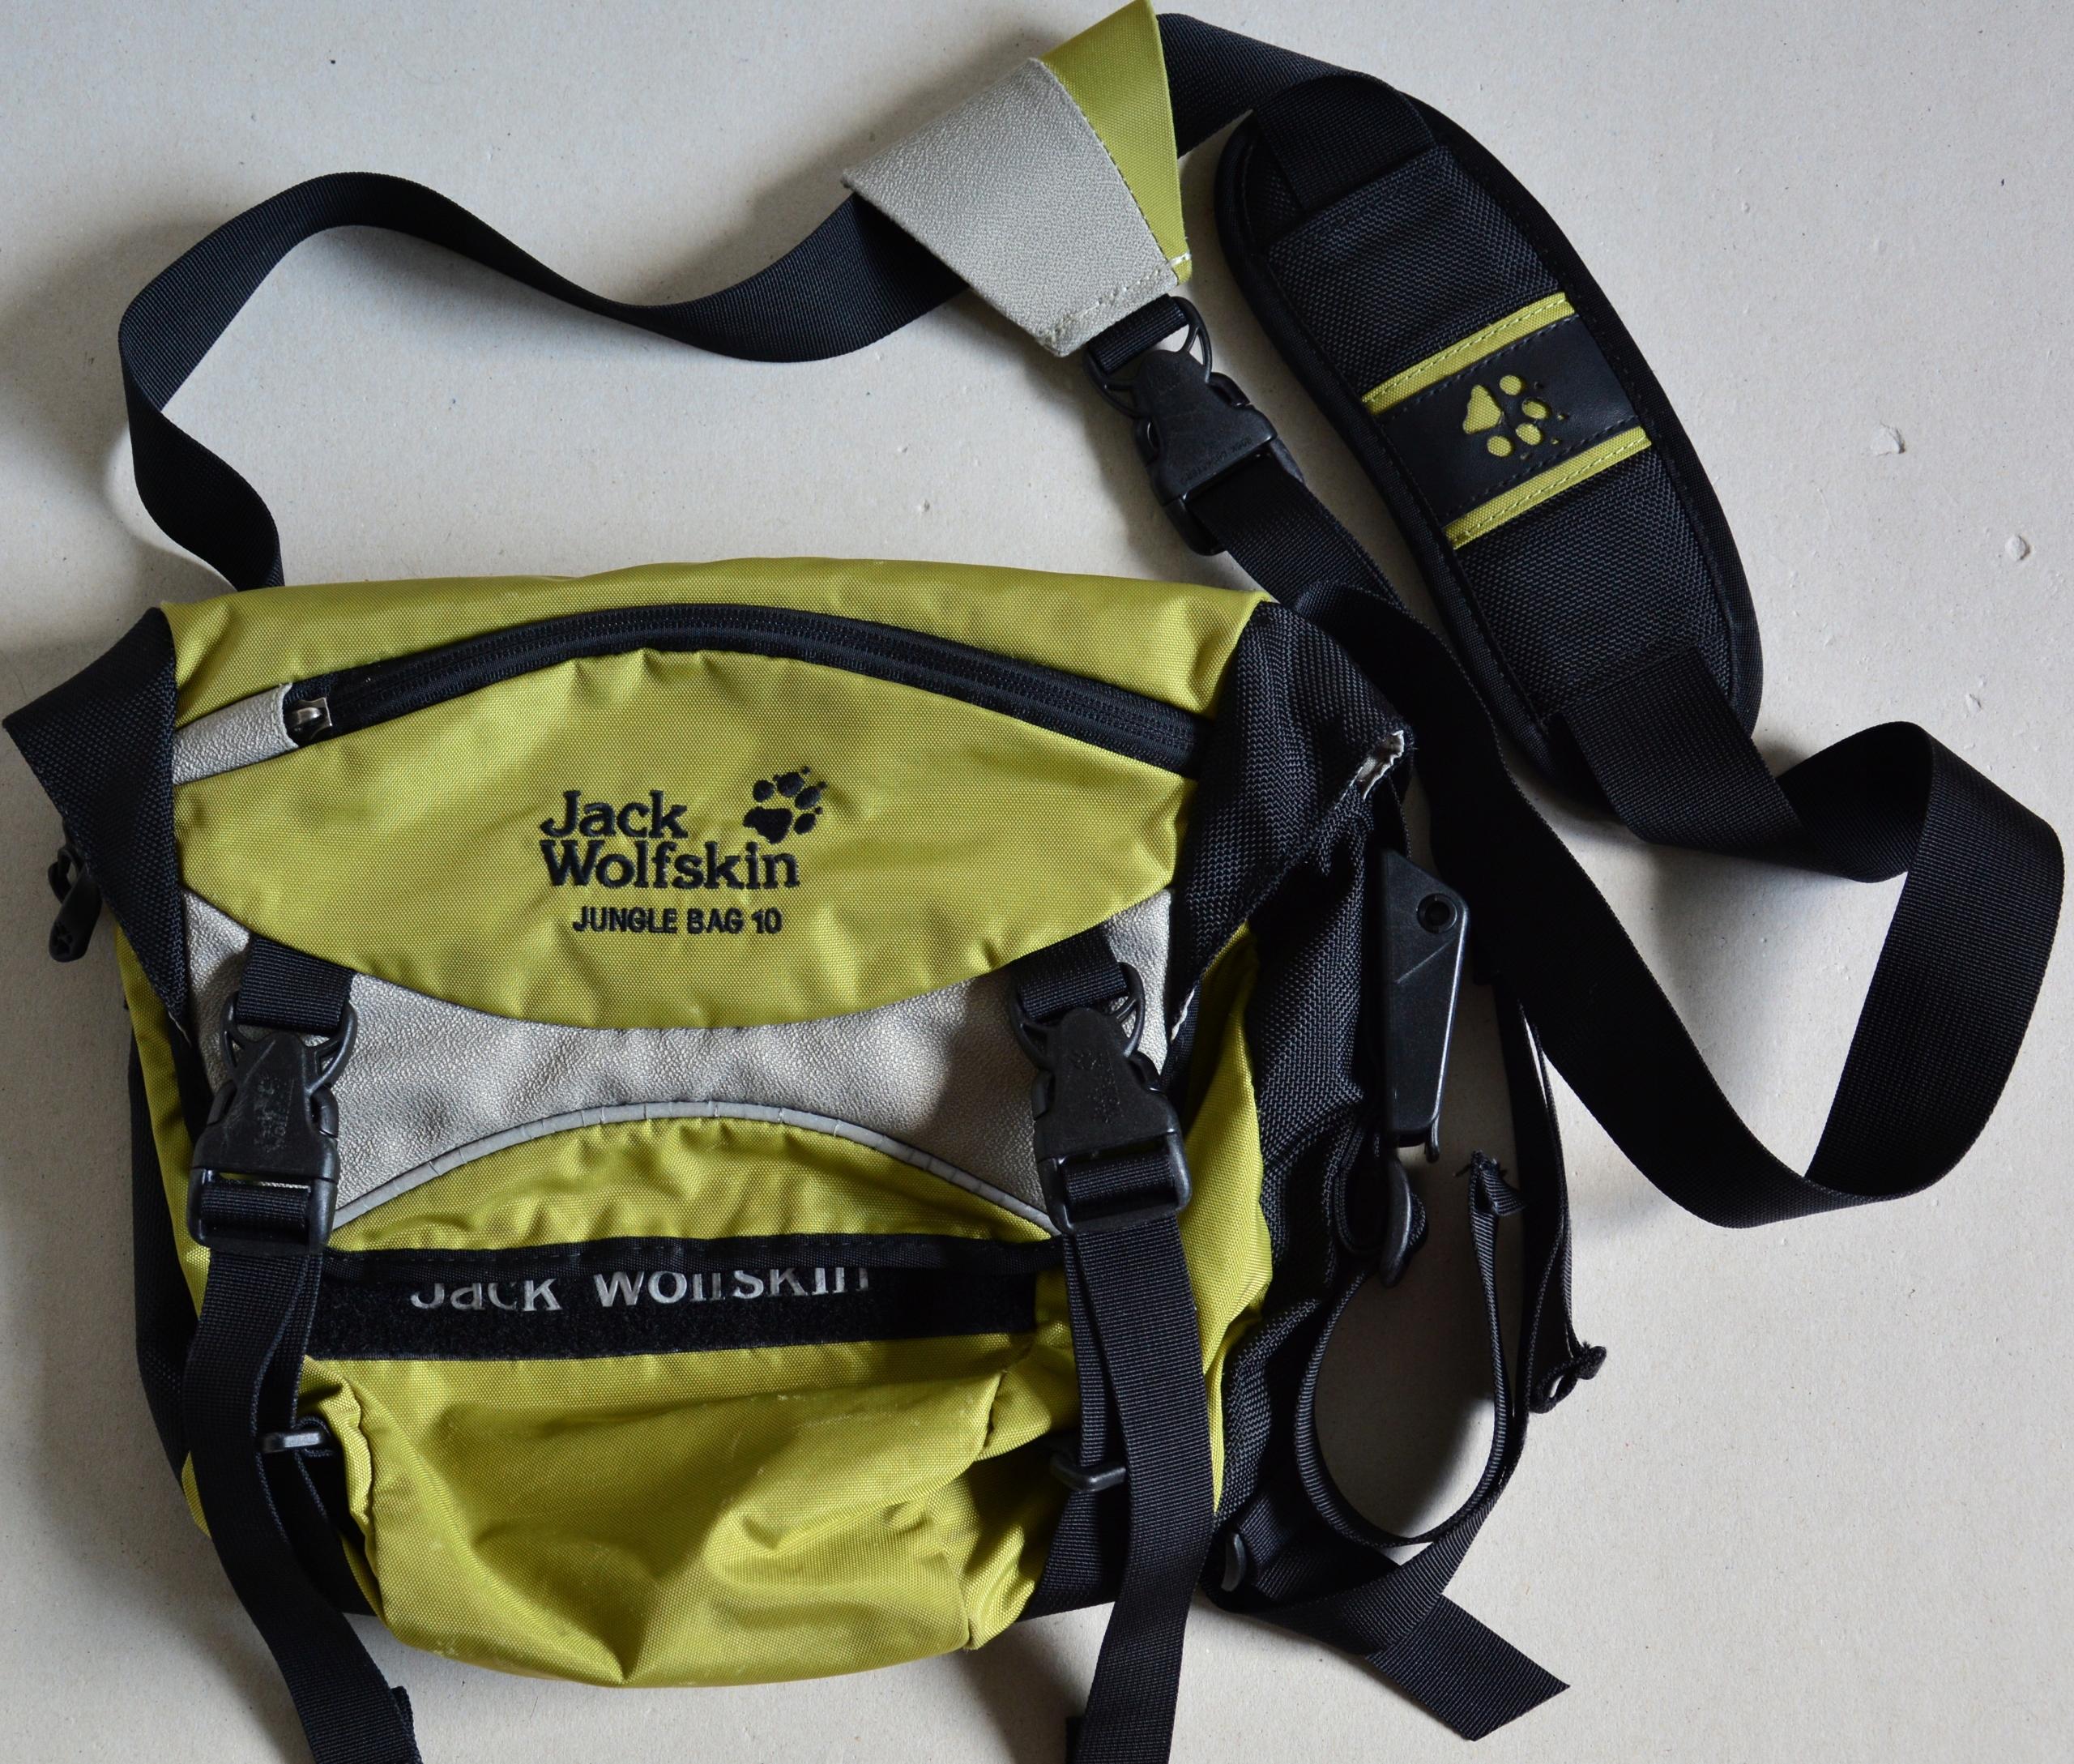 Torba JACK WOLFSKIN JUNGLE BAG 10